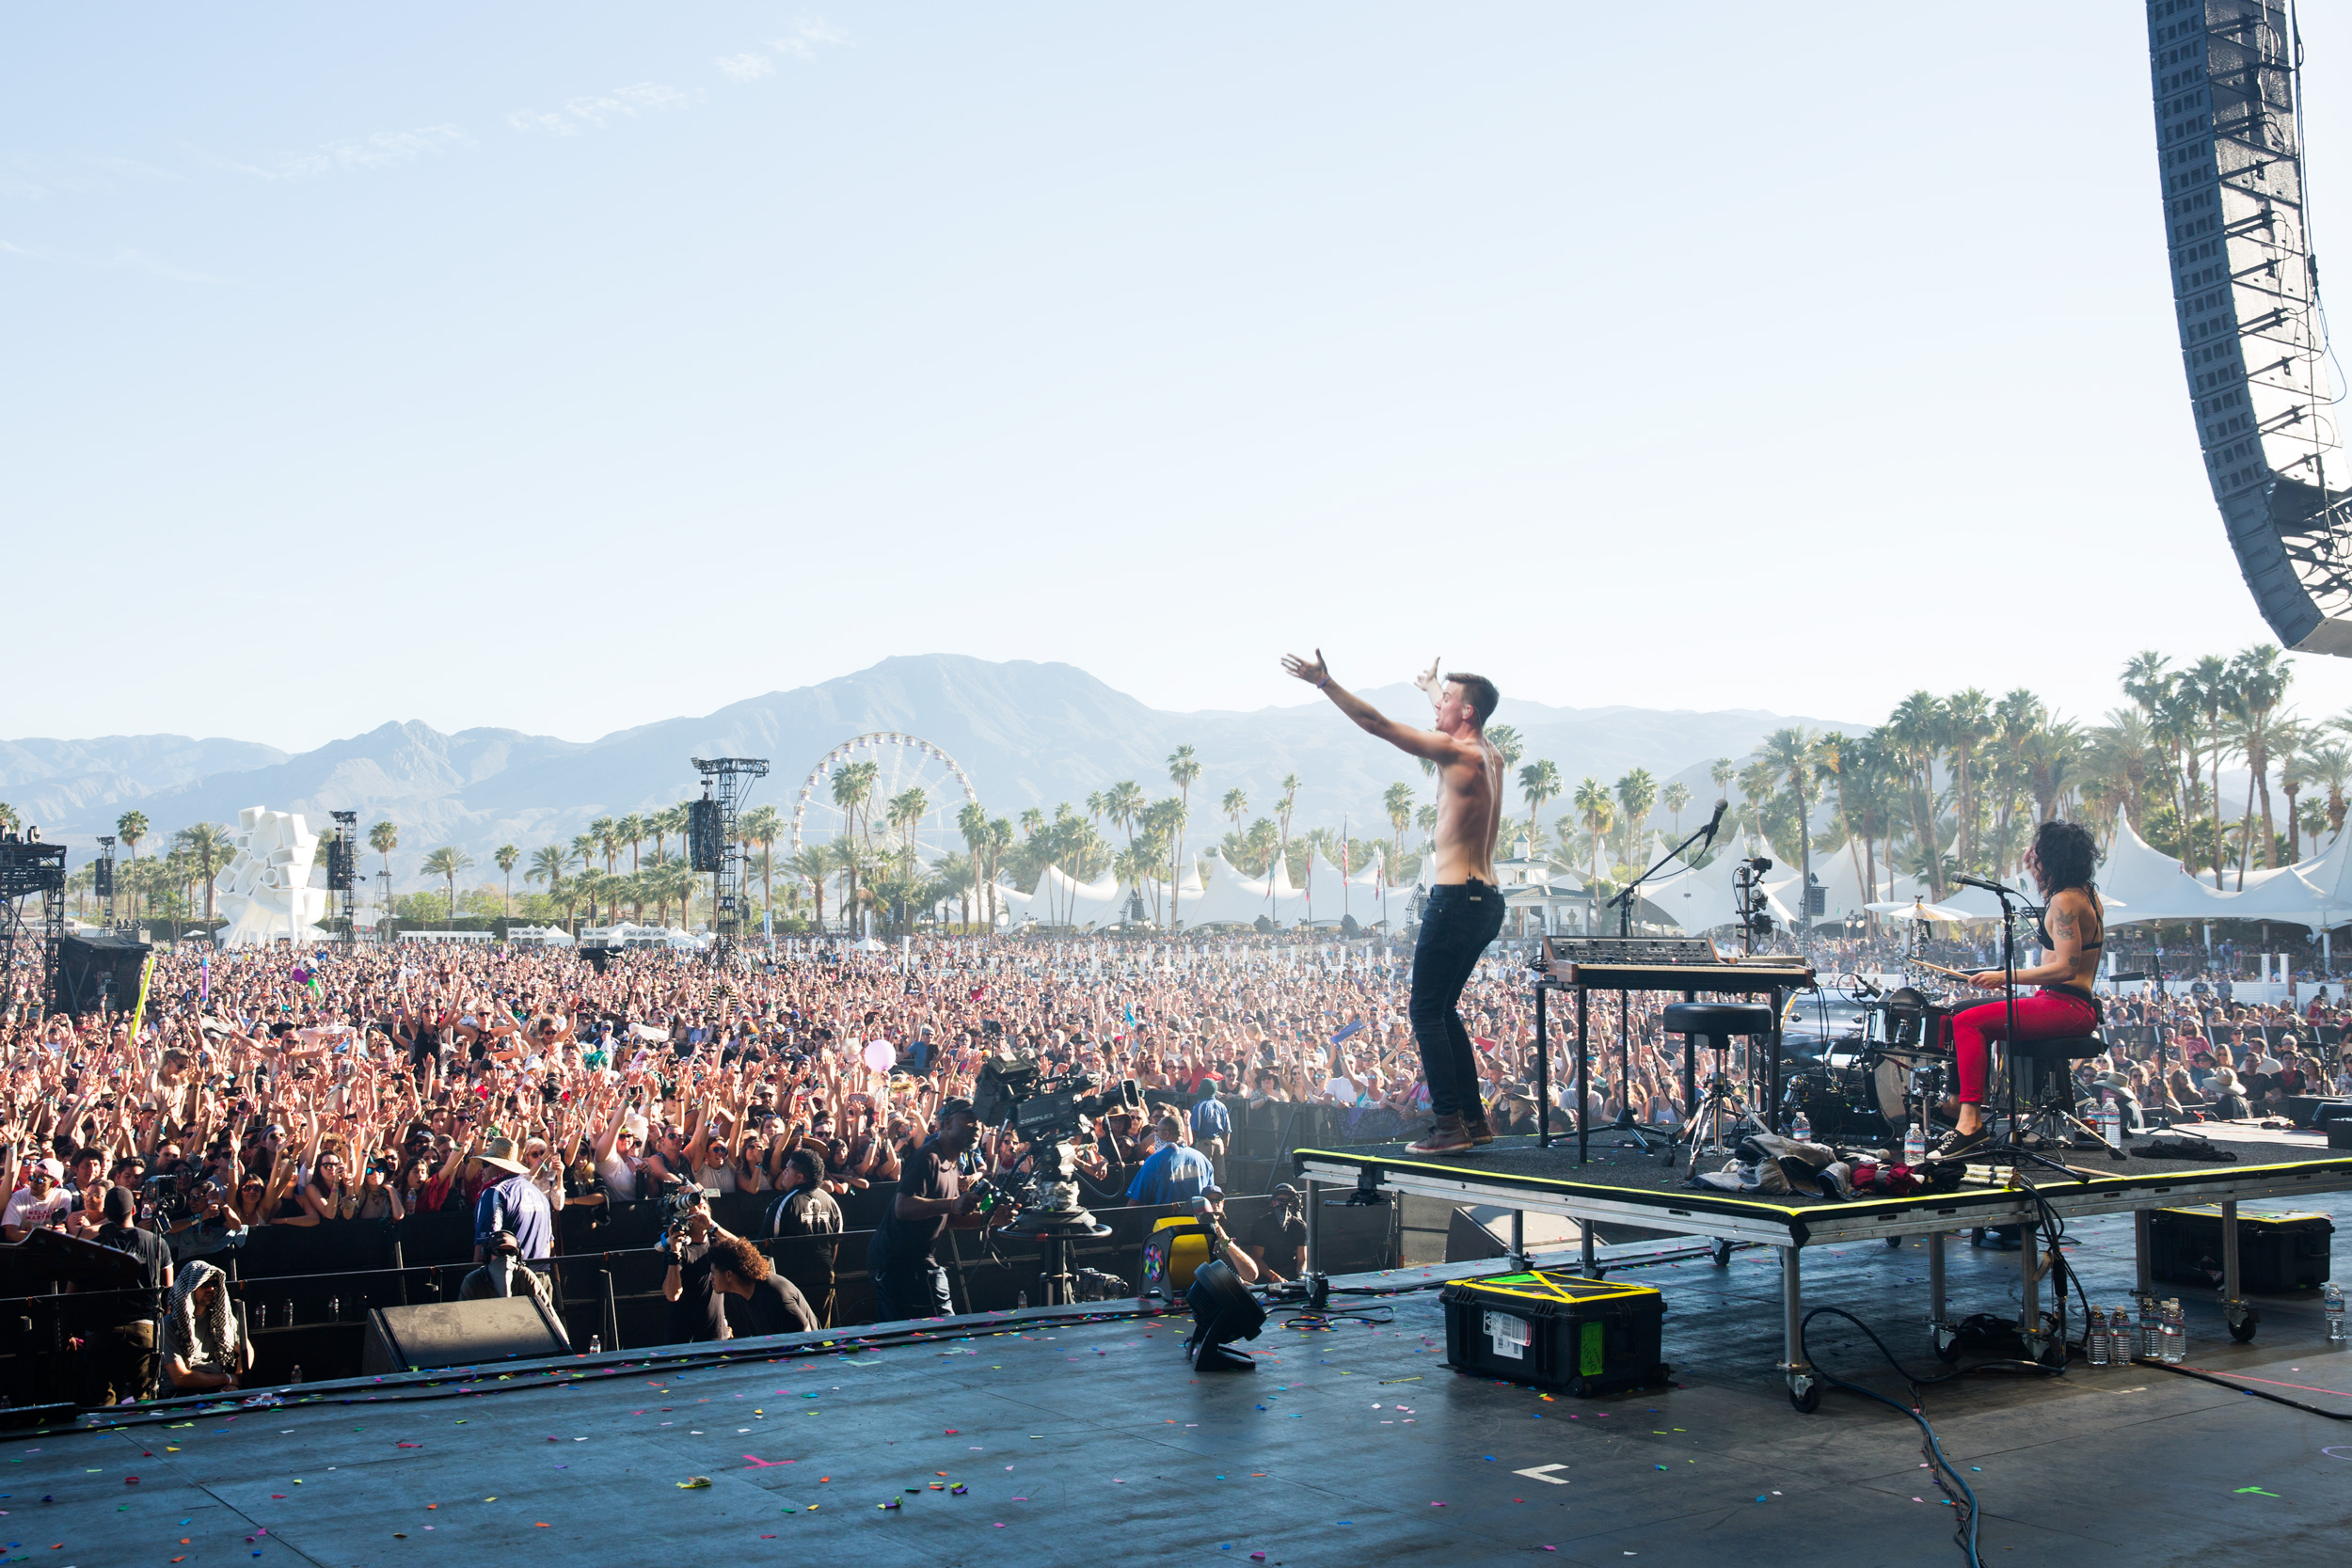 Matt and Kim perform on the Coachella Stage on Sunday.